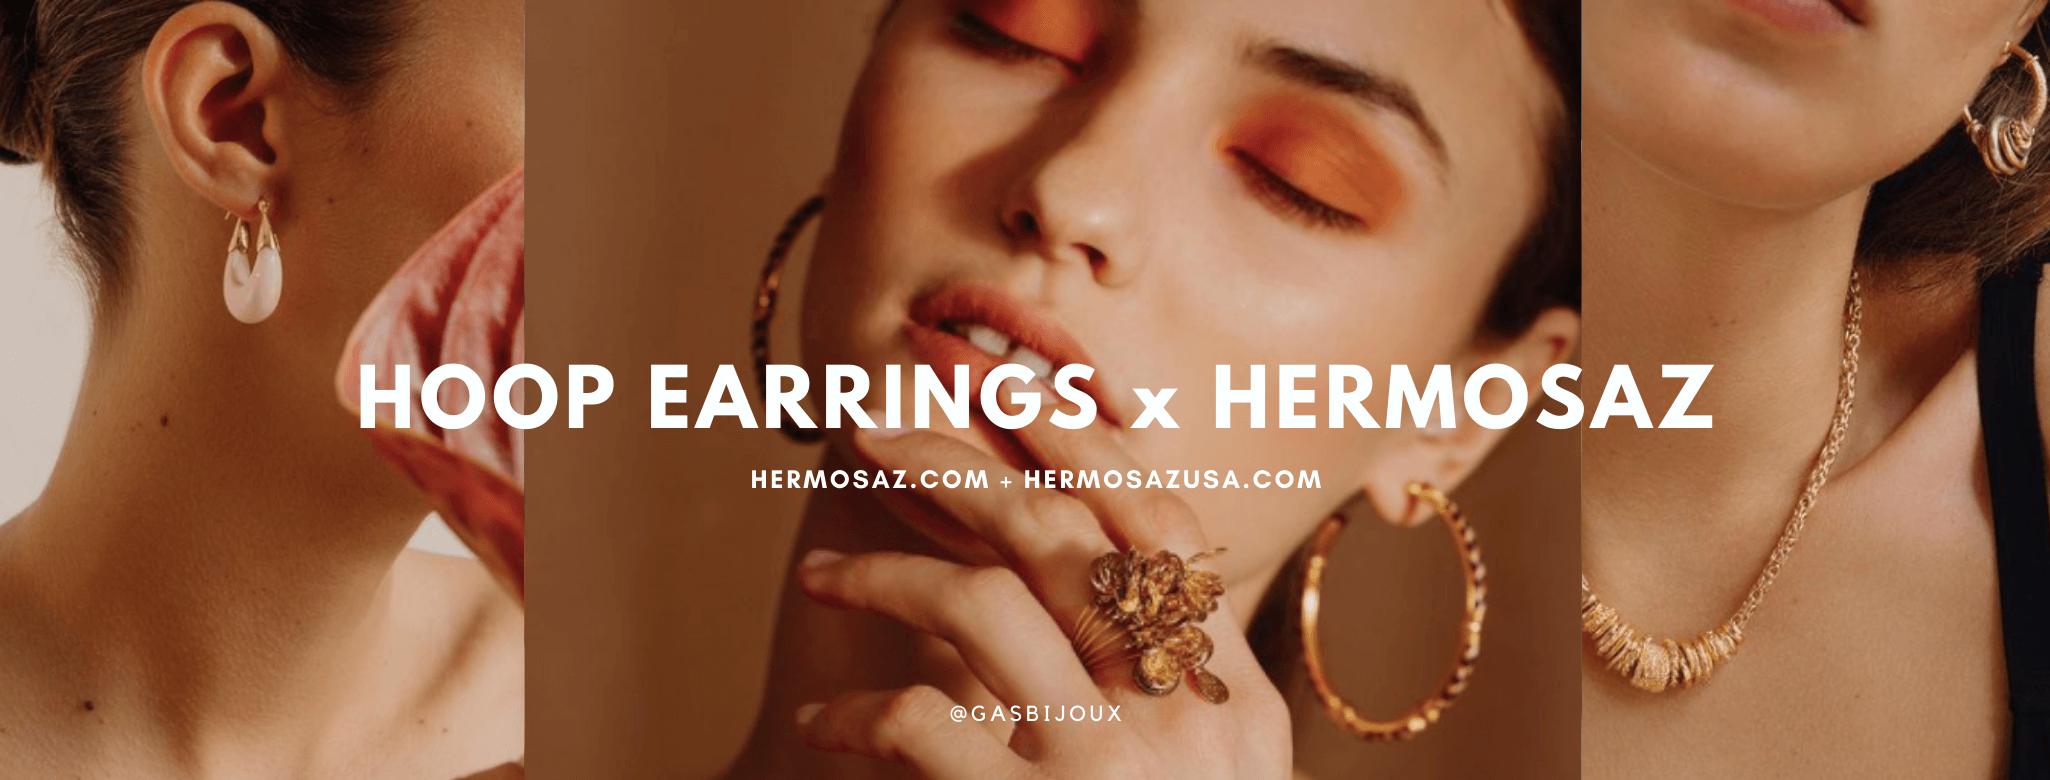 Hoop Earrings x Hermosaz